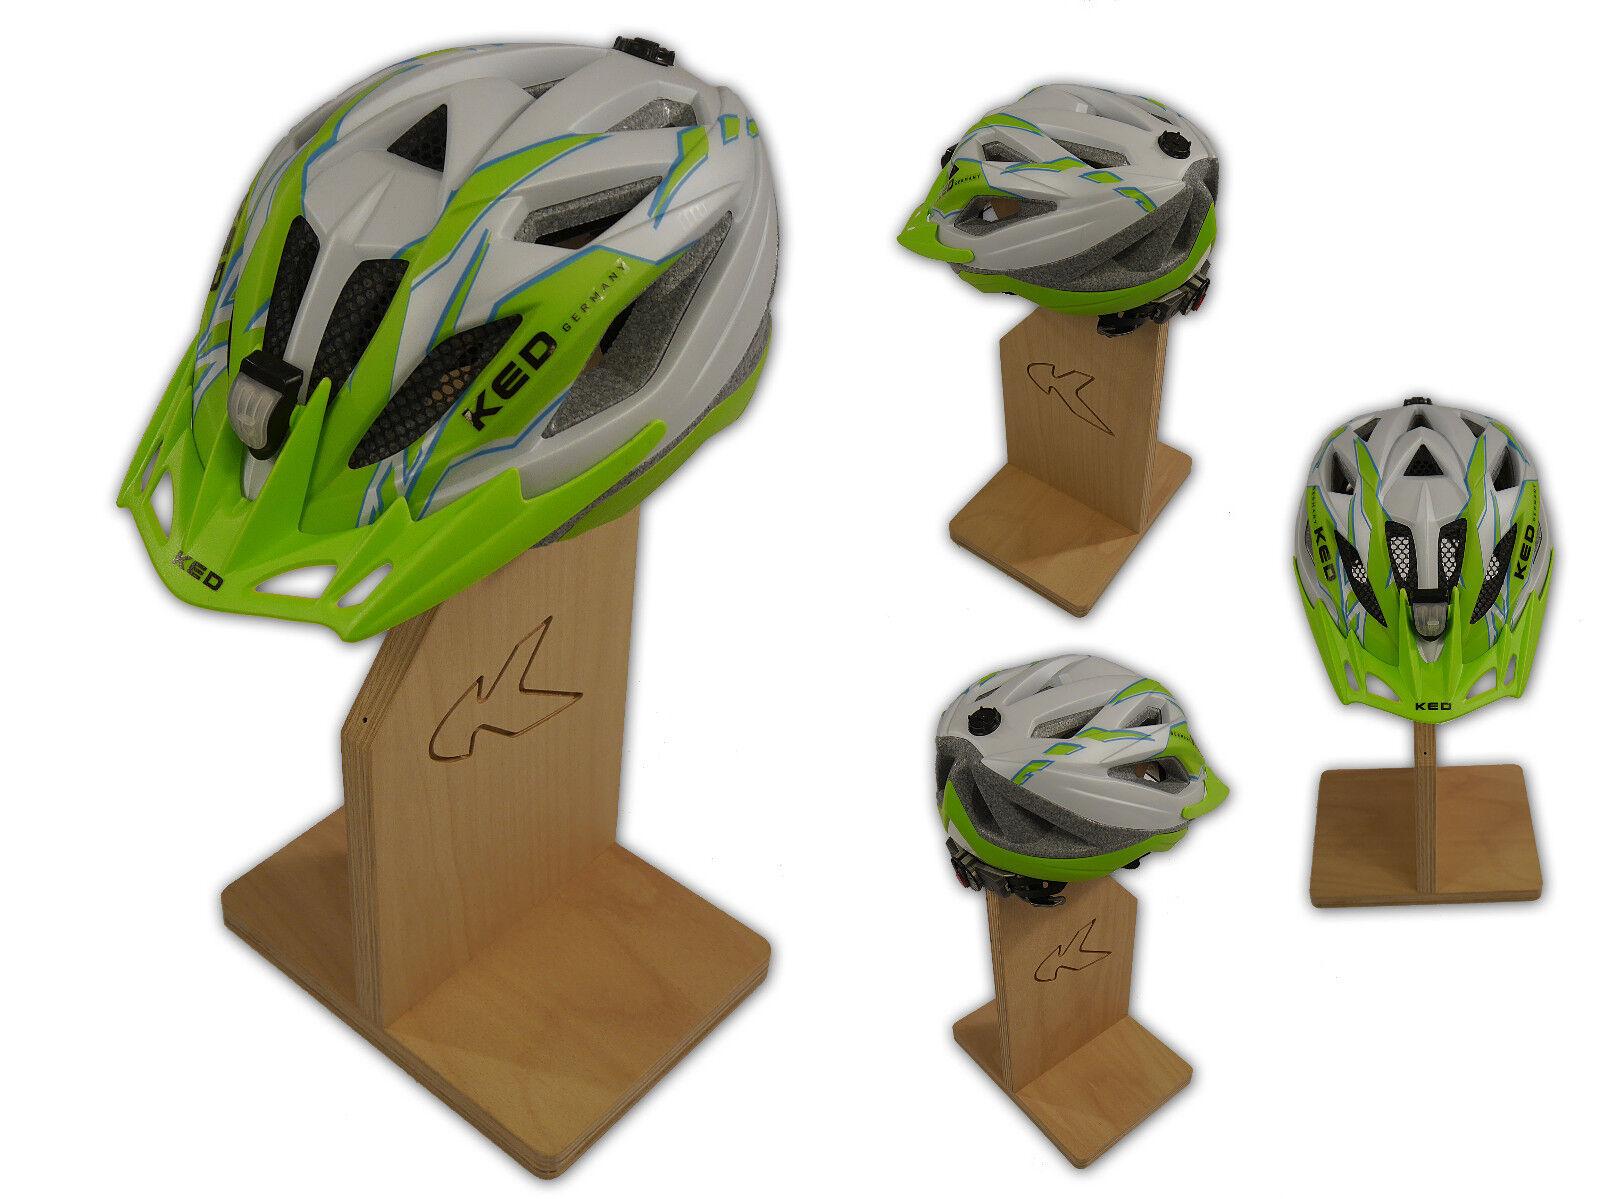 KED Street Jr. lemon Grün Jugendhelm Kinderhelm Kinderhelm Kinderhelm Fahrradhelm S oder M NEU  | Vollständige Spezifikation  4c6c1a